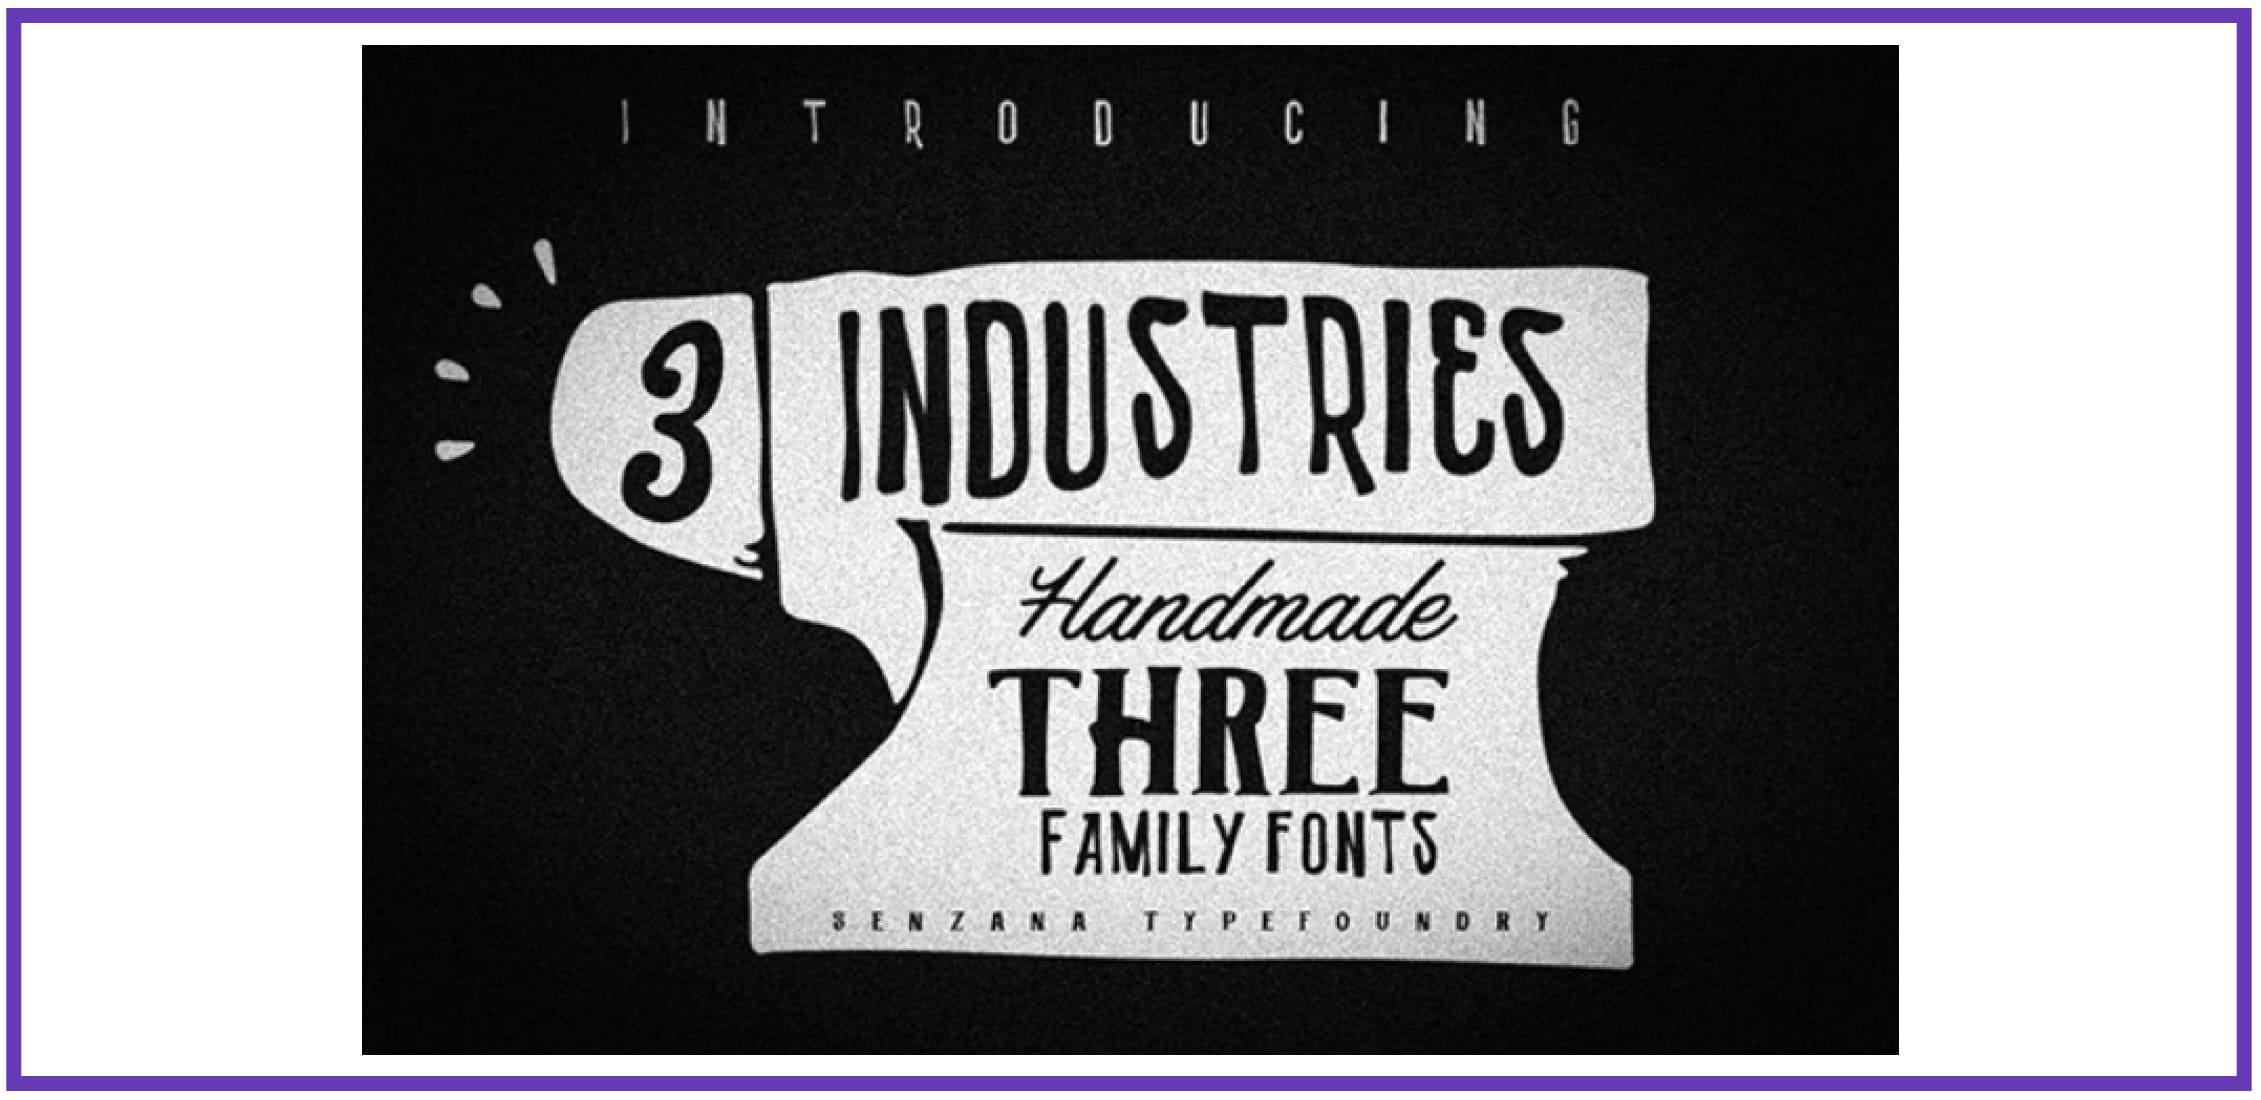 3 Font Industries. Best Industrial Fonts.